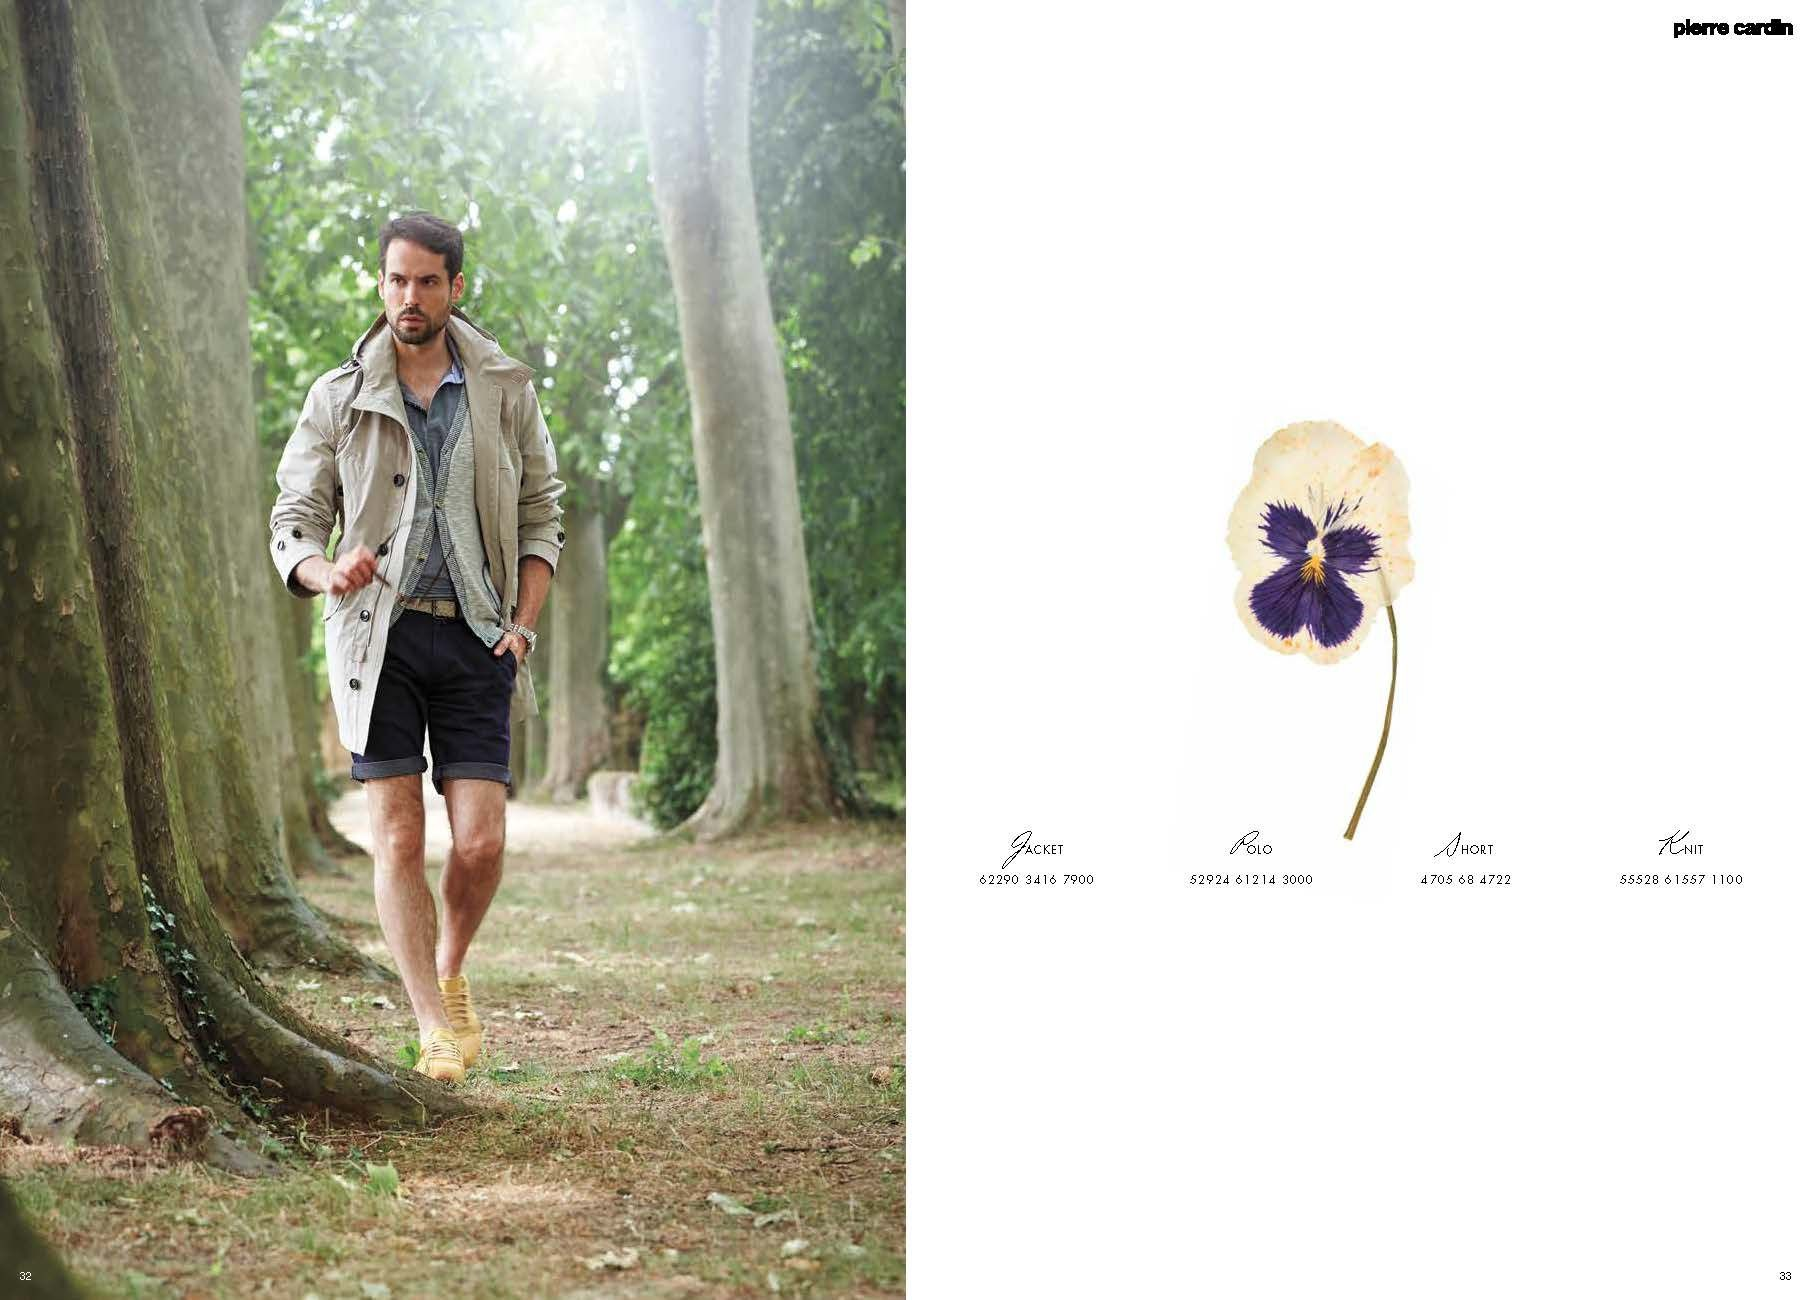 Pierre Cardin Lookbook s/s 16